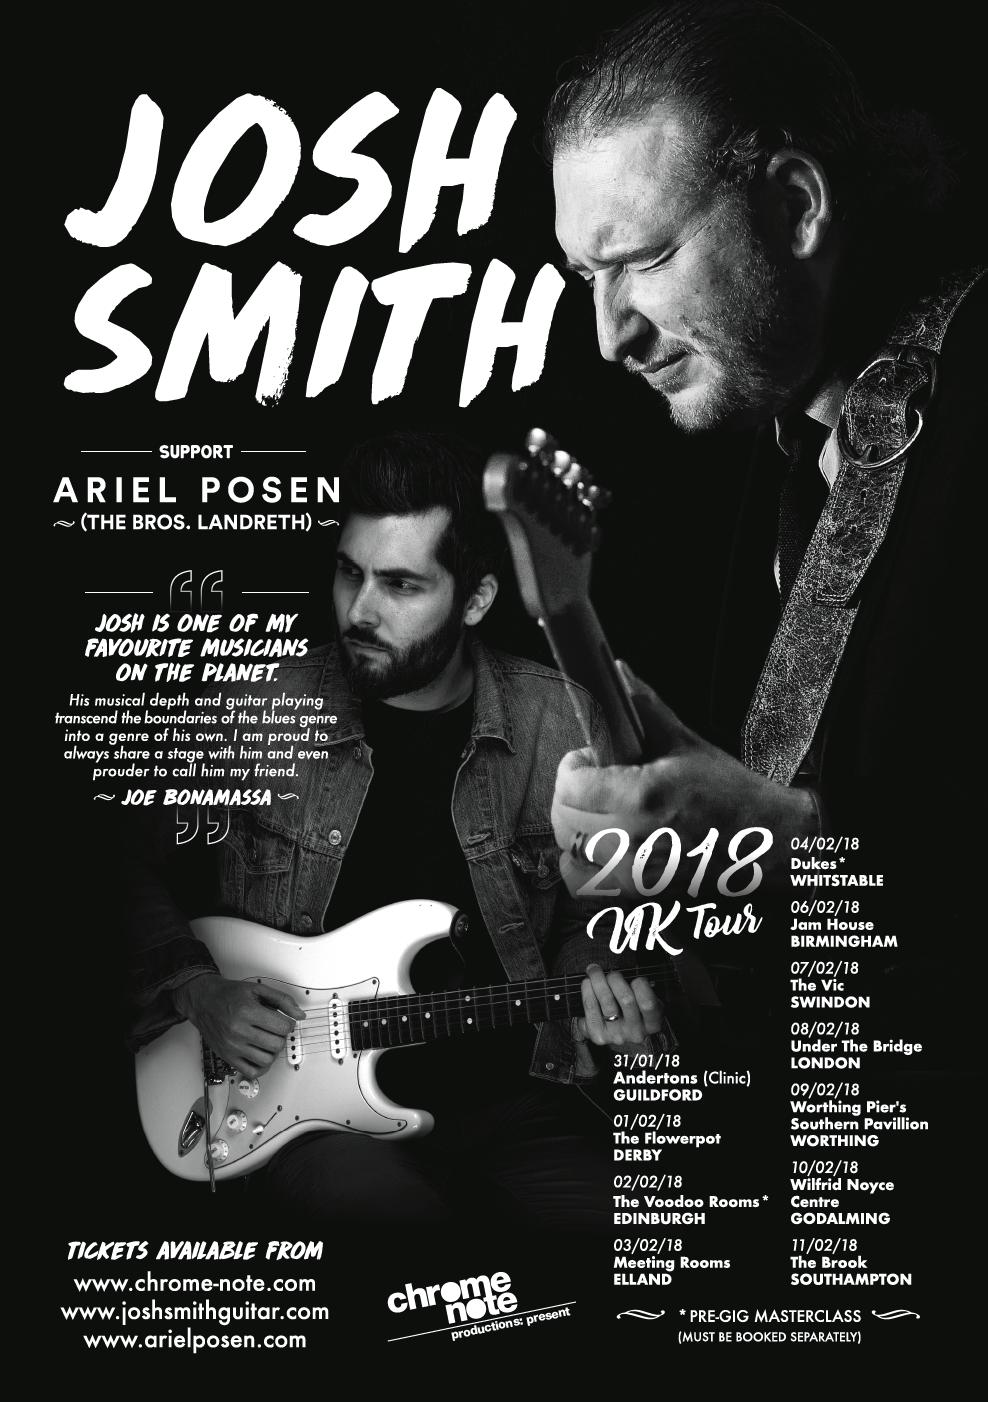 Josh Smith - Under the Bridge